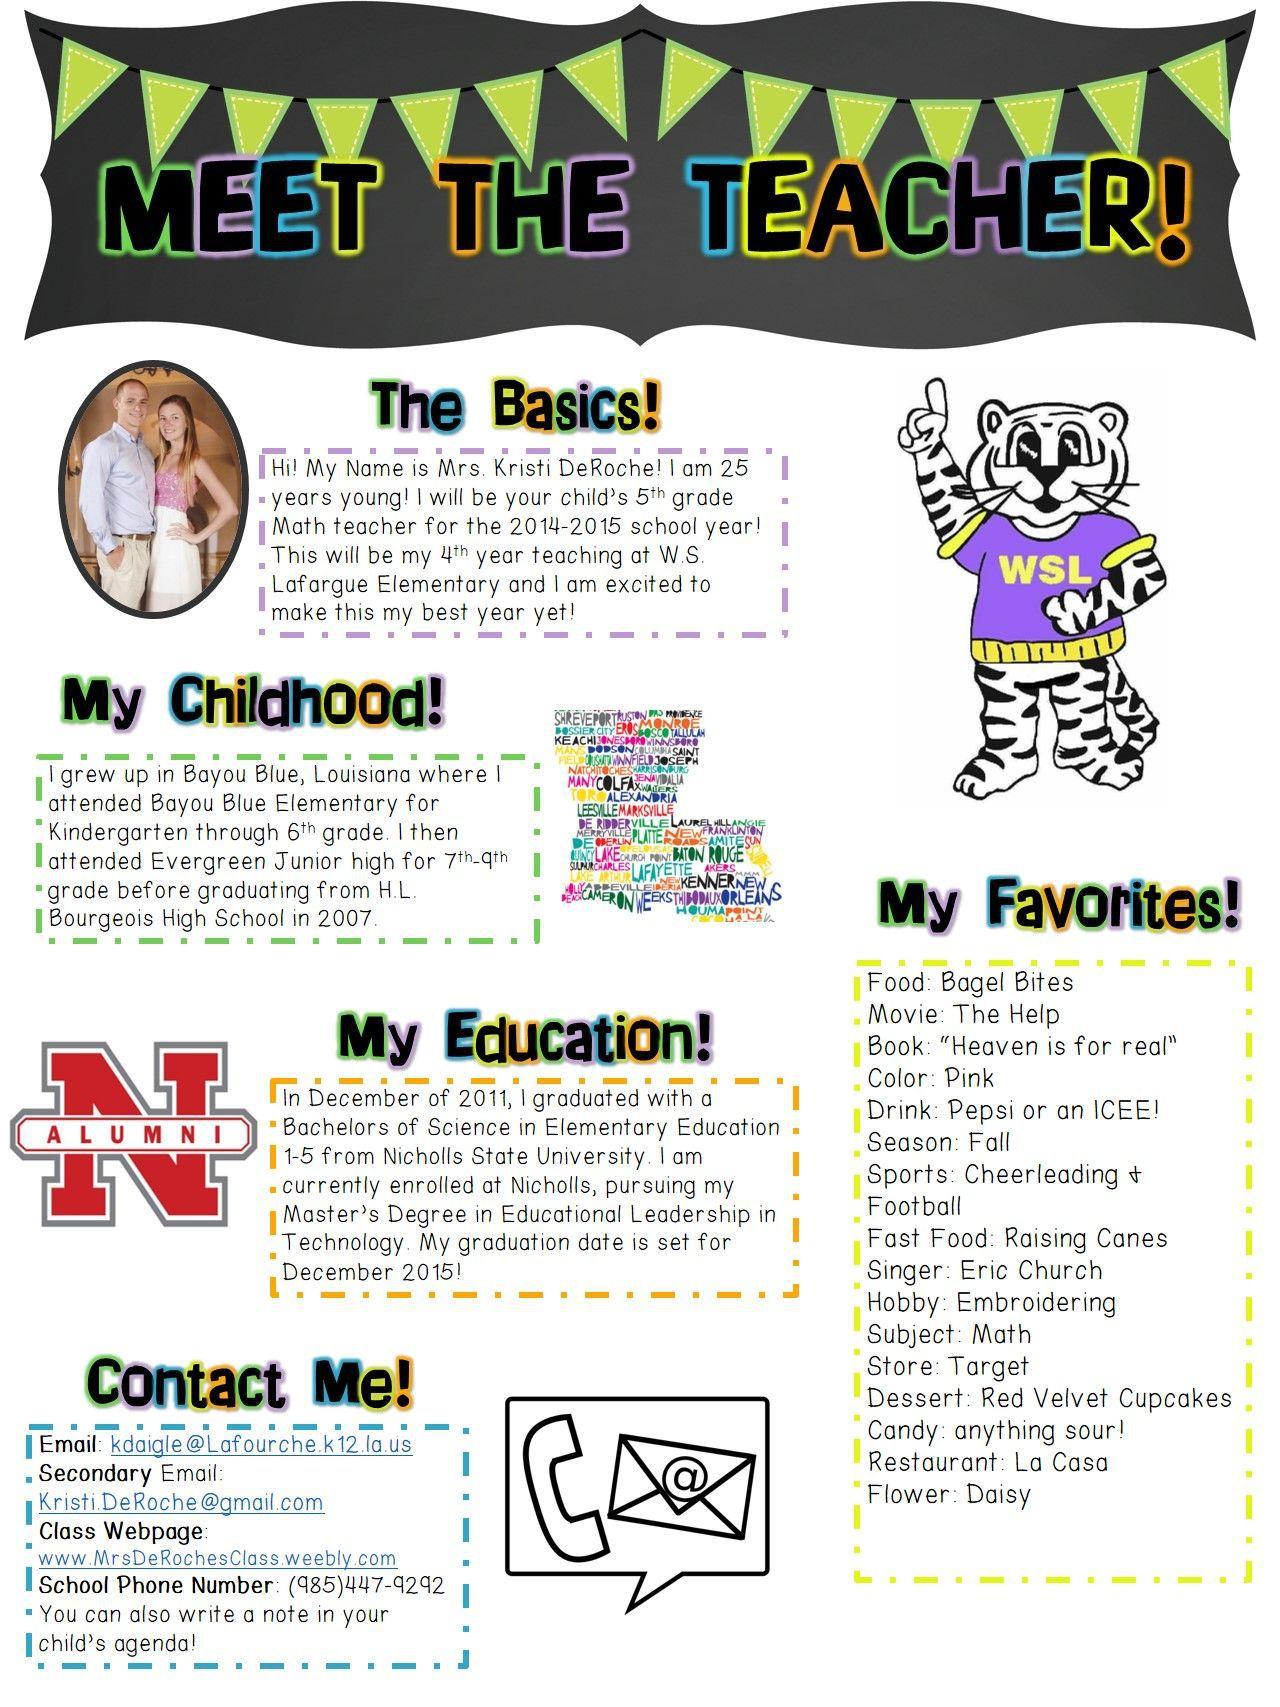 000 Surprising Newsletter Template For Teacher Highest Clarity  Teachers To Parent Printable Free SchoolFull